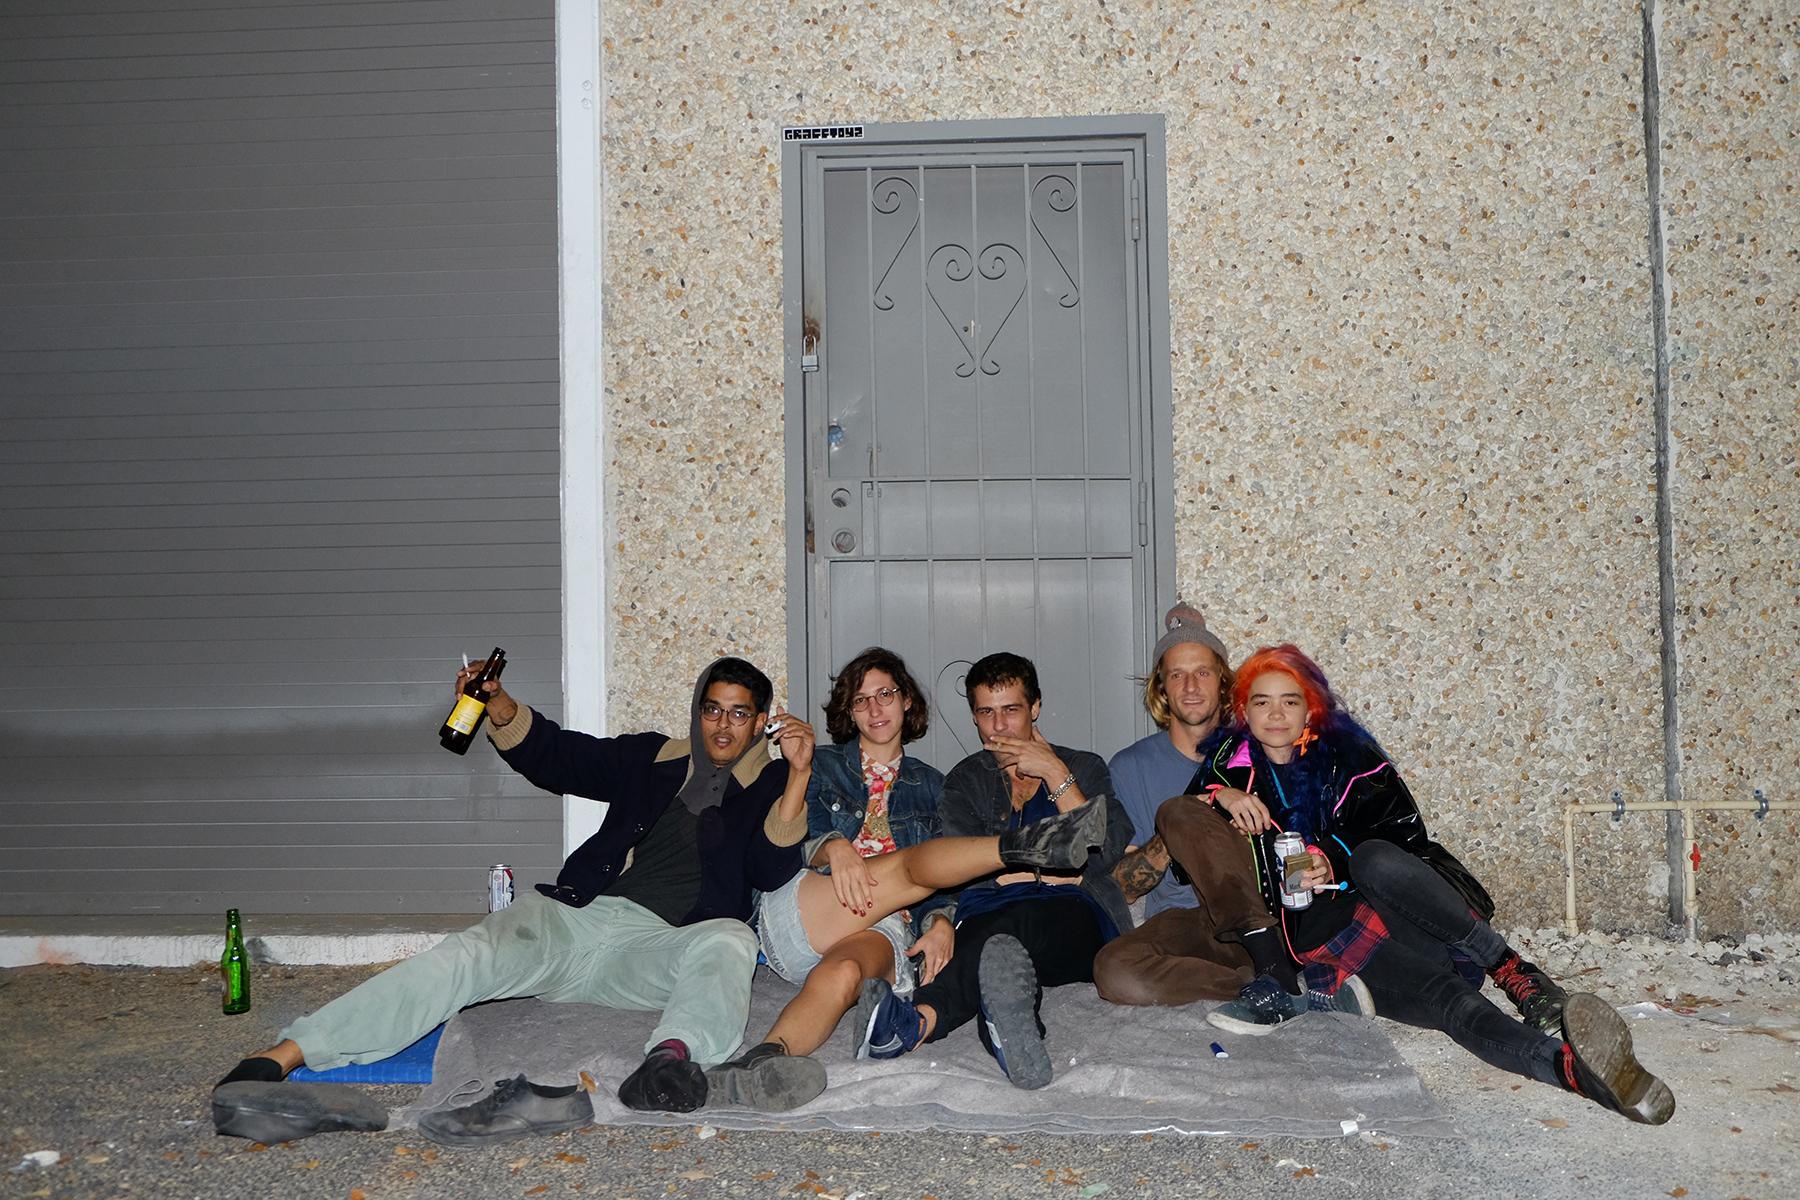 Franky, Deon, Michael, Giles, Tara, 7111, Little Haiti, 2014.